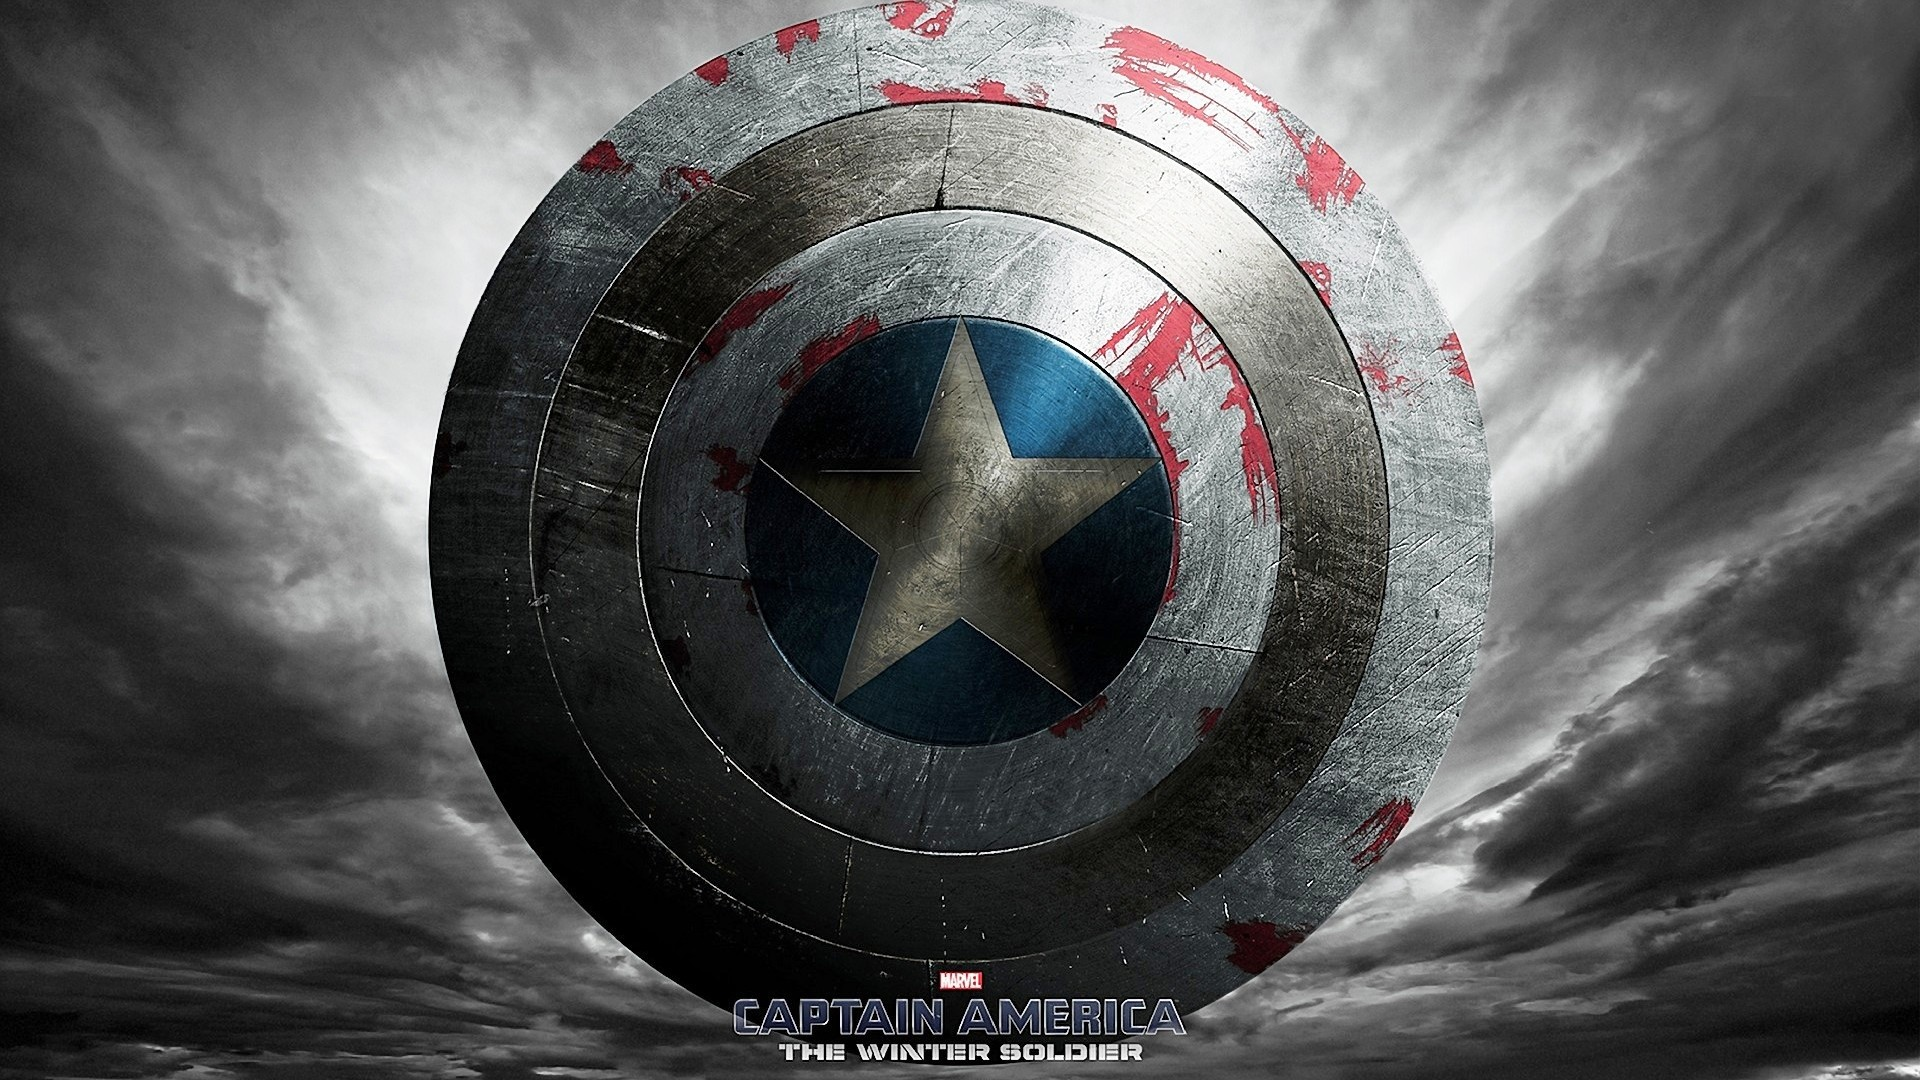 Captain America IPhone 6 Wallpaper (85+ Images